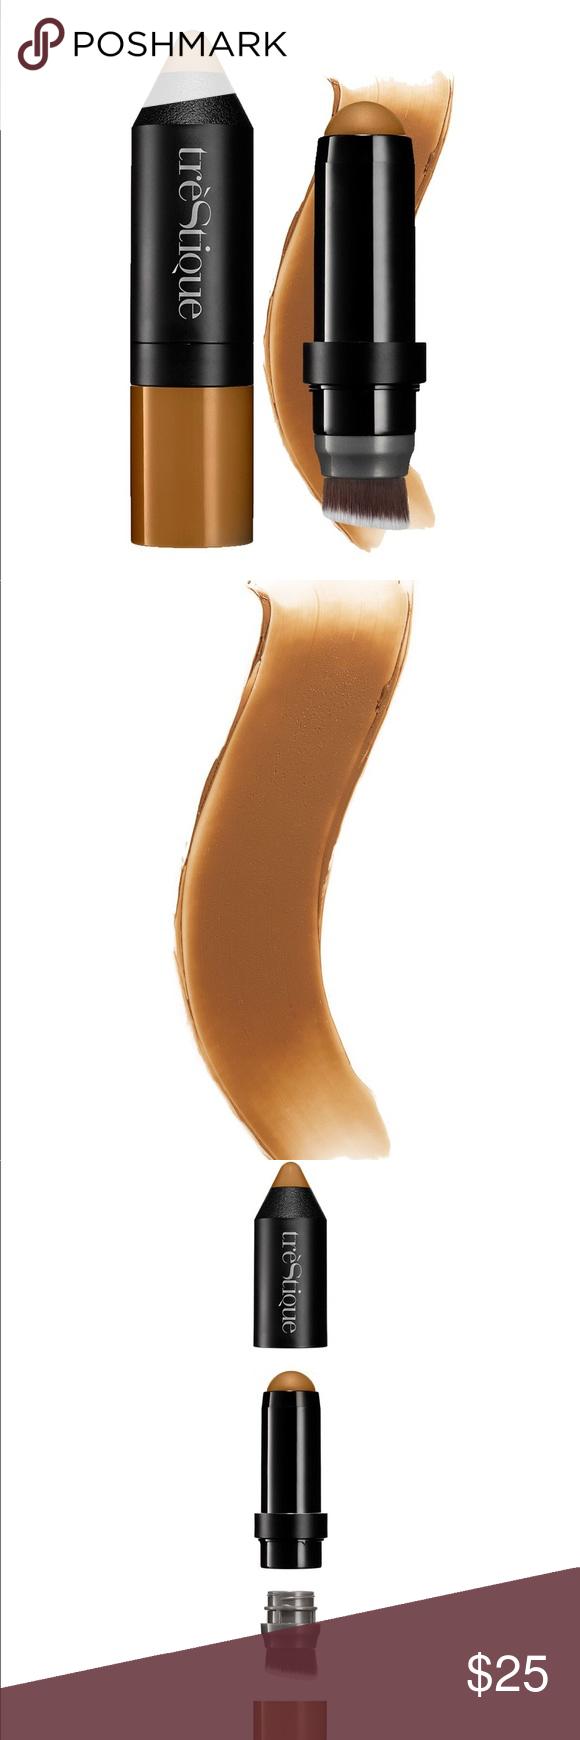 trèstique contour bronzer stick. •i swatched this on the